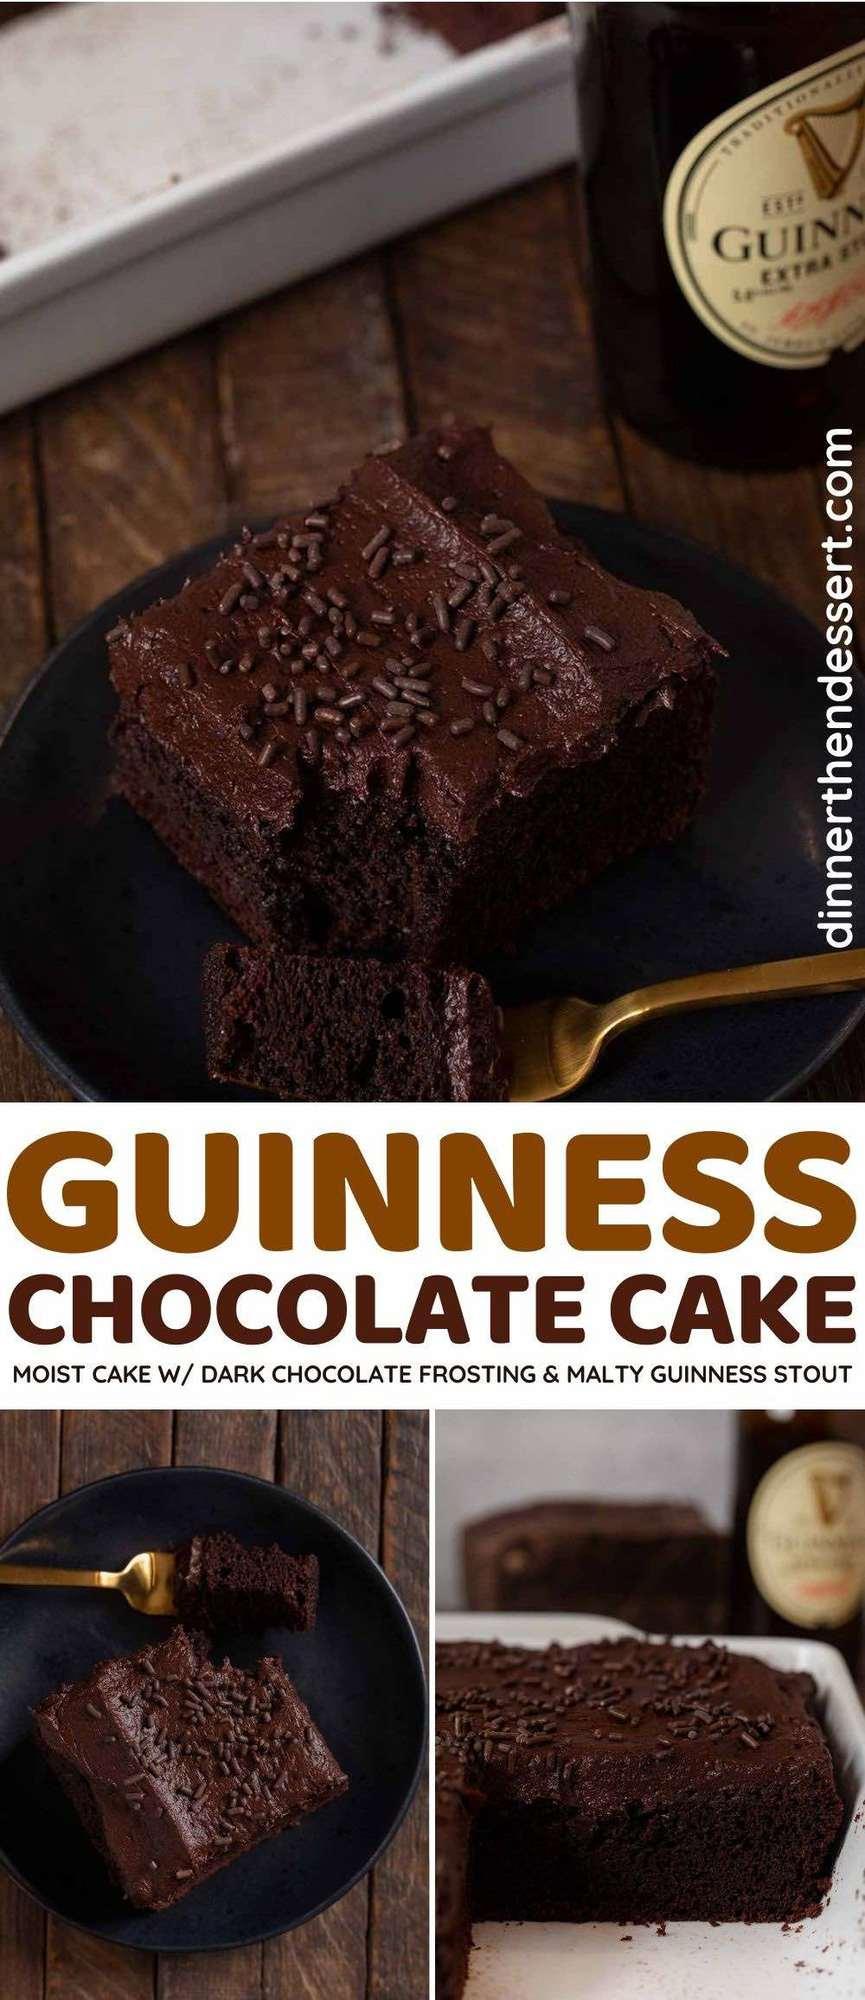 Moist Guinness Chocolate Cake